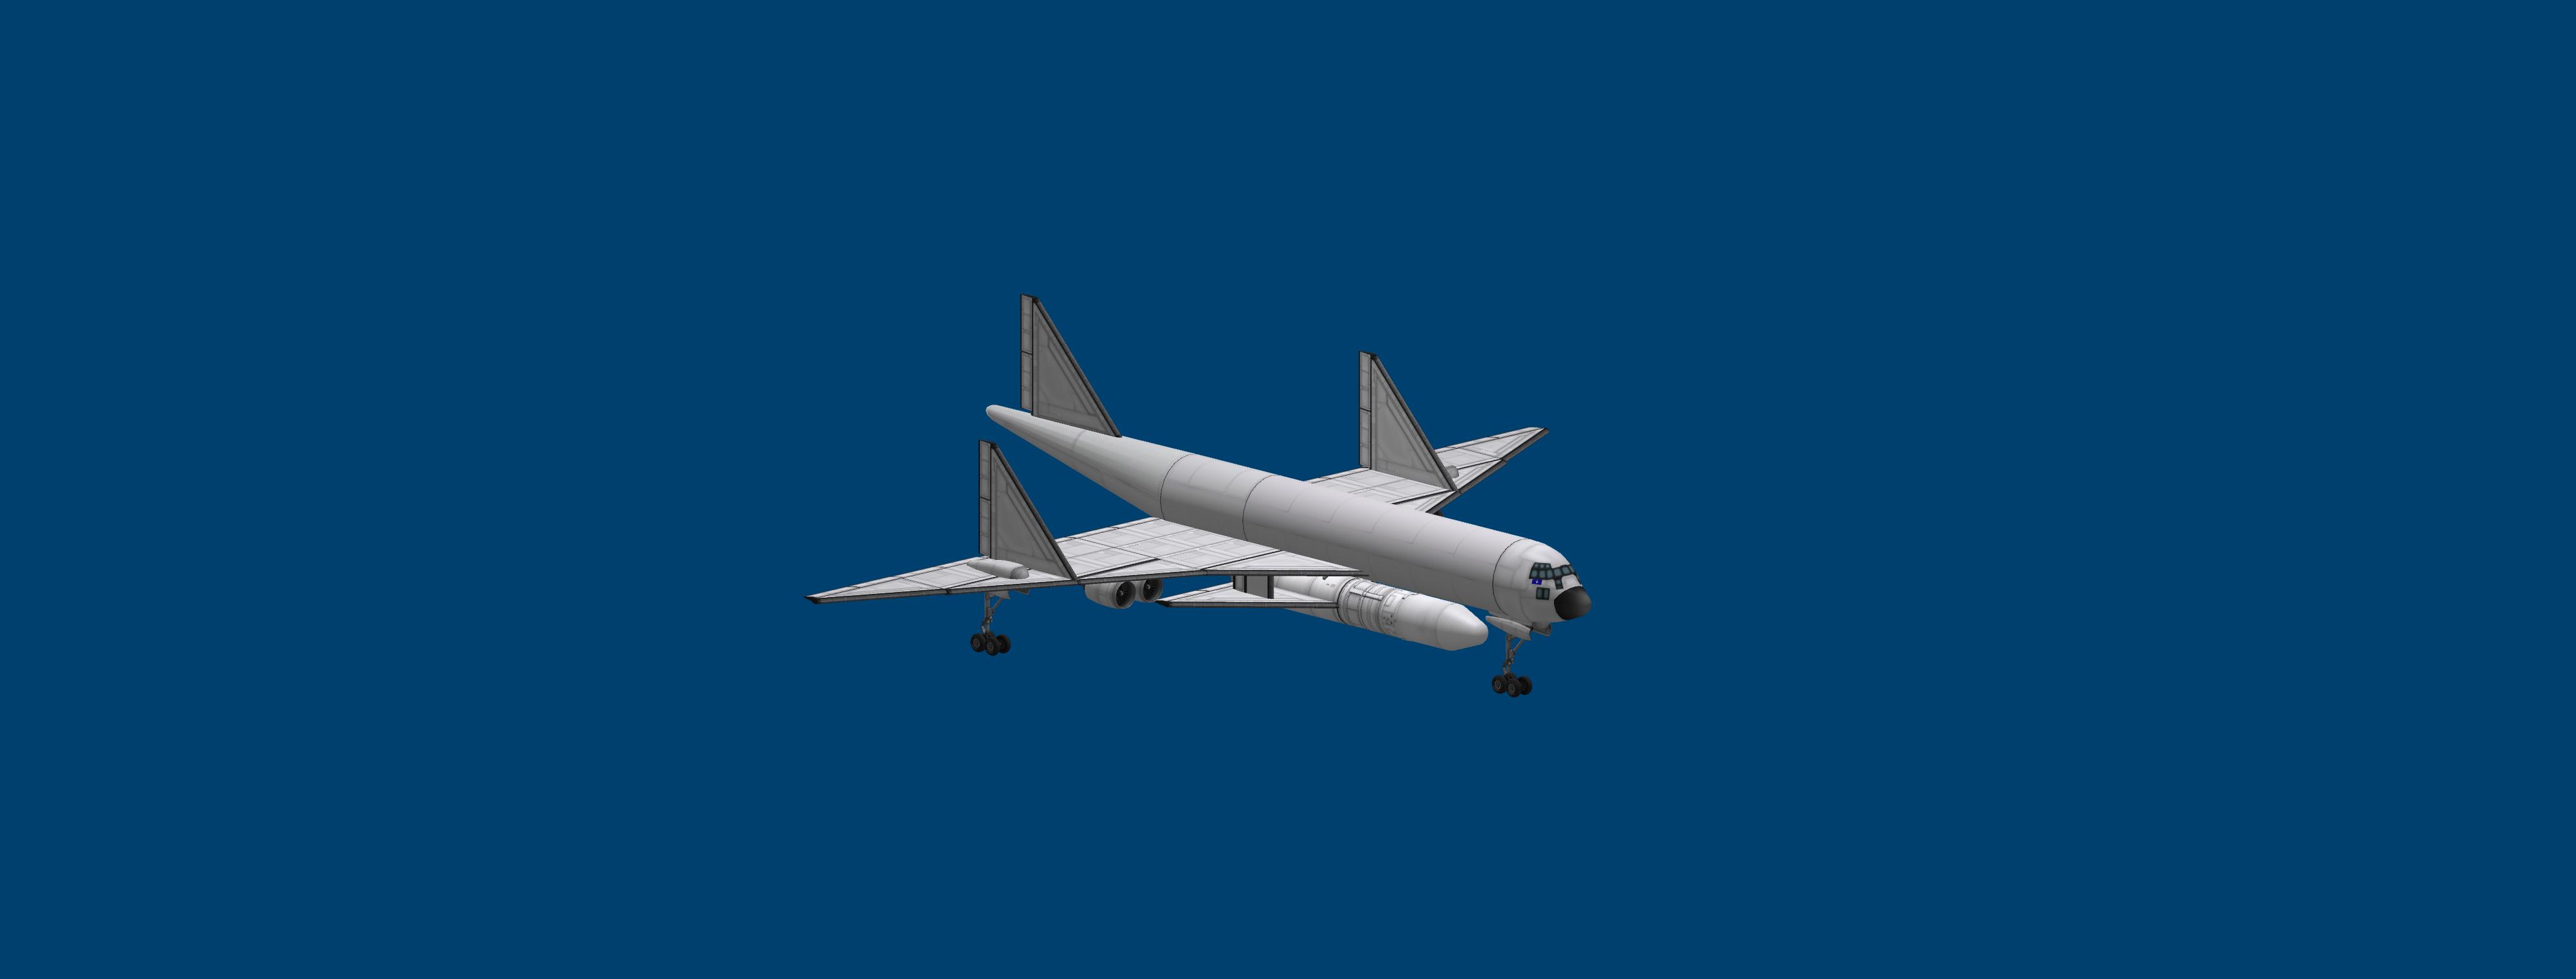 cumulo-Nimbus-aircraft.png